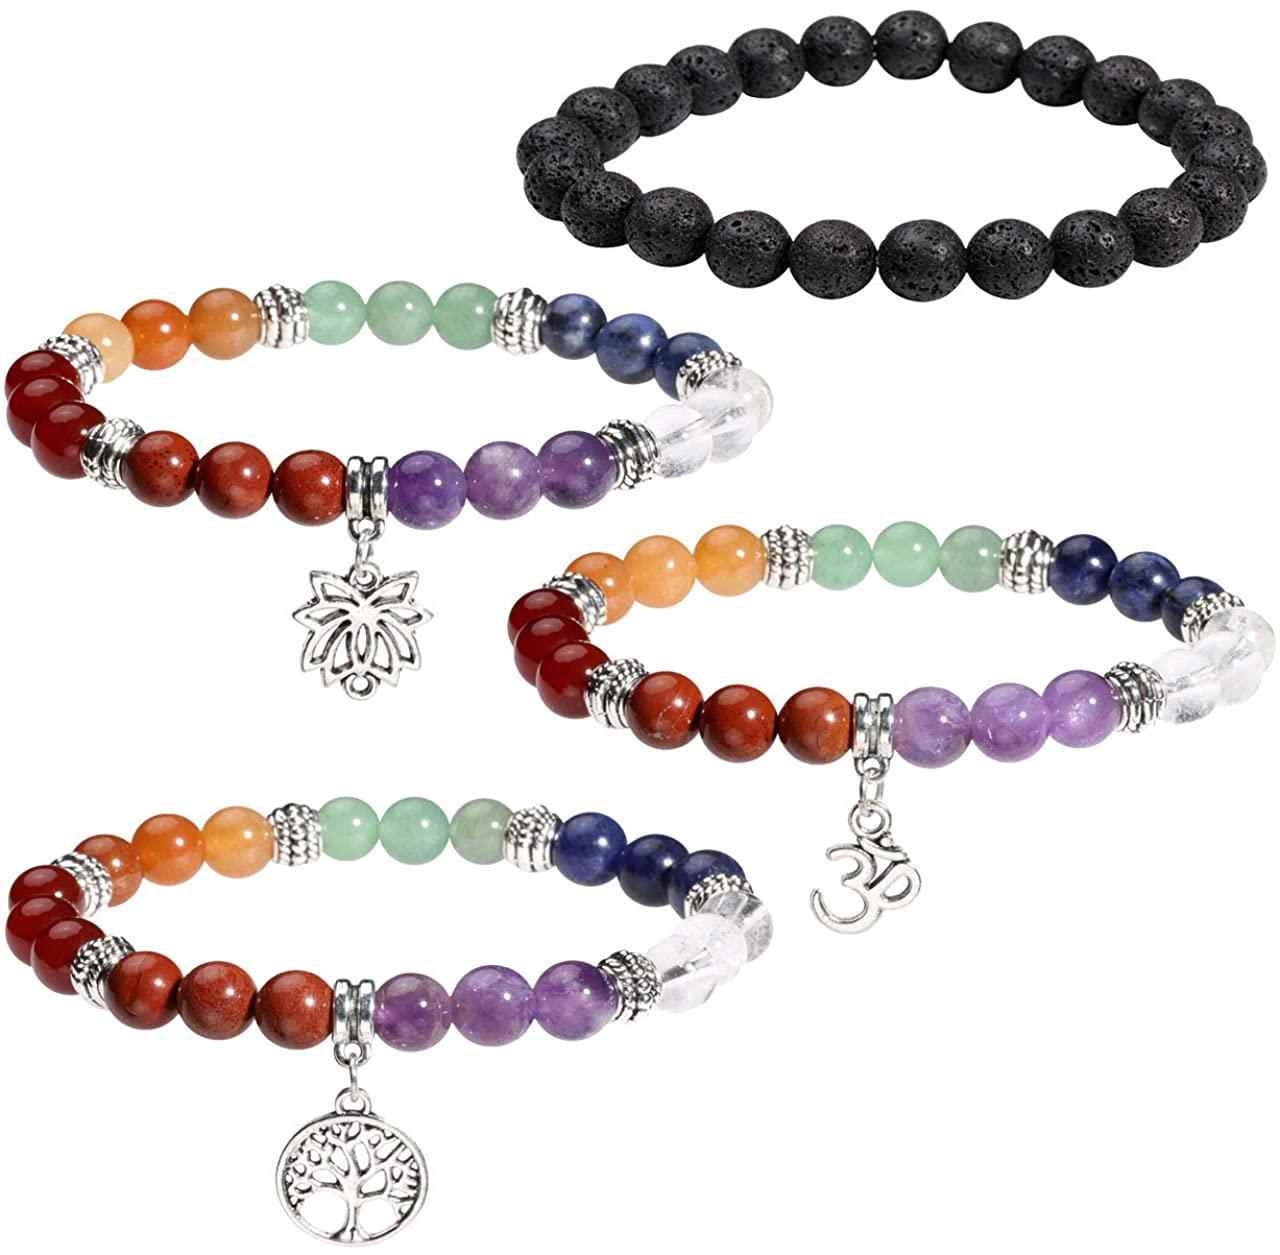 Manfnee Natural Stone Bracelet 7 Chakra Healing Beaded Bangle for Men Women Stretch